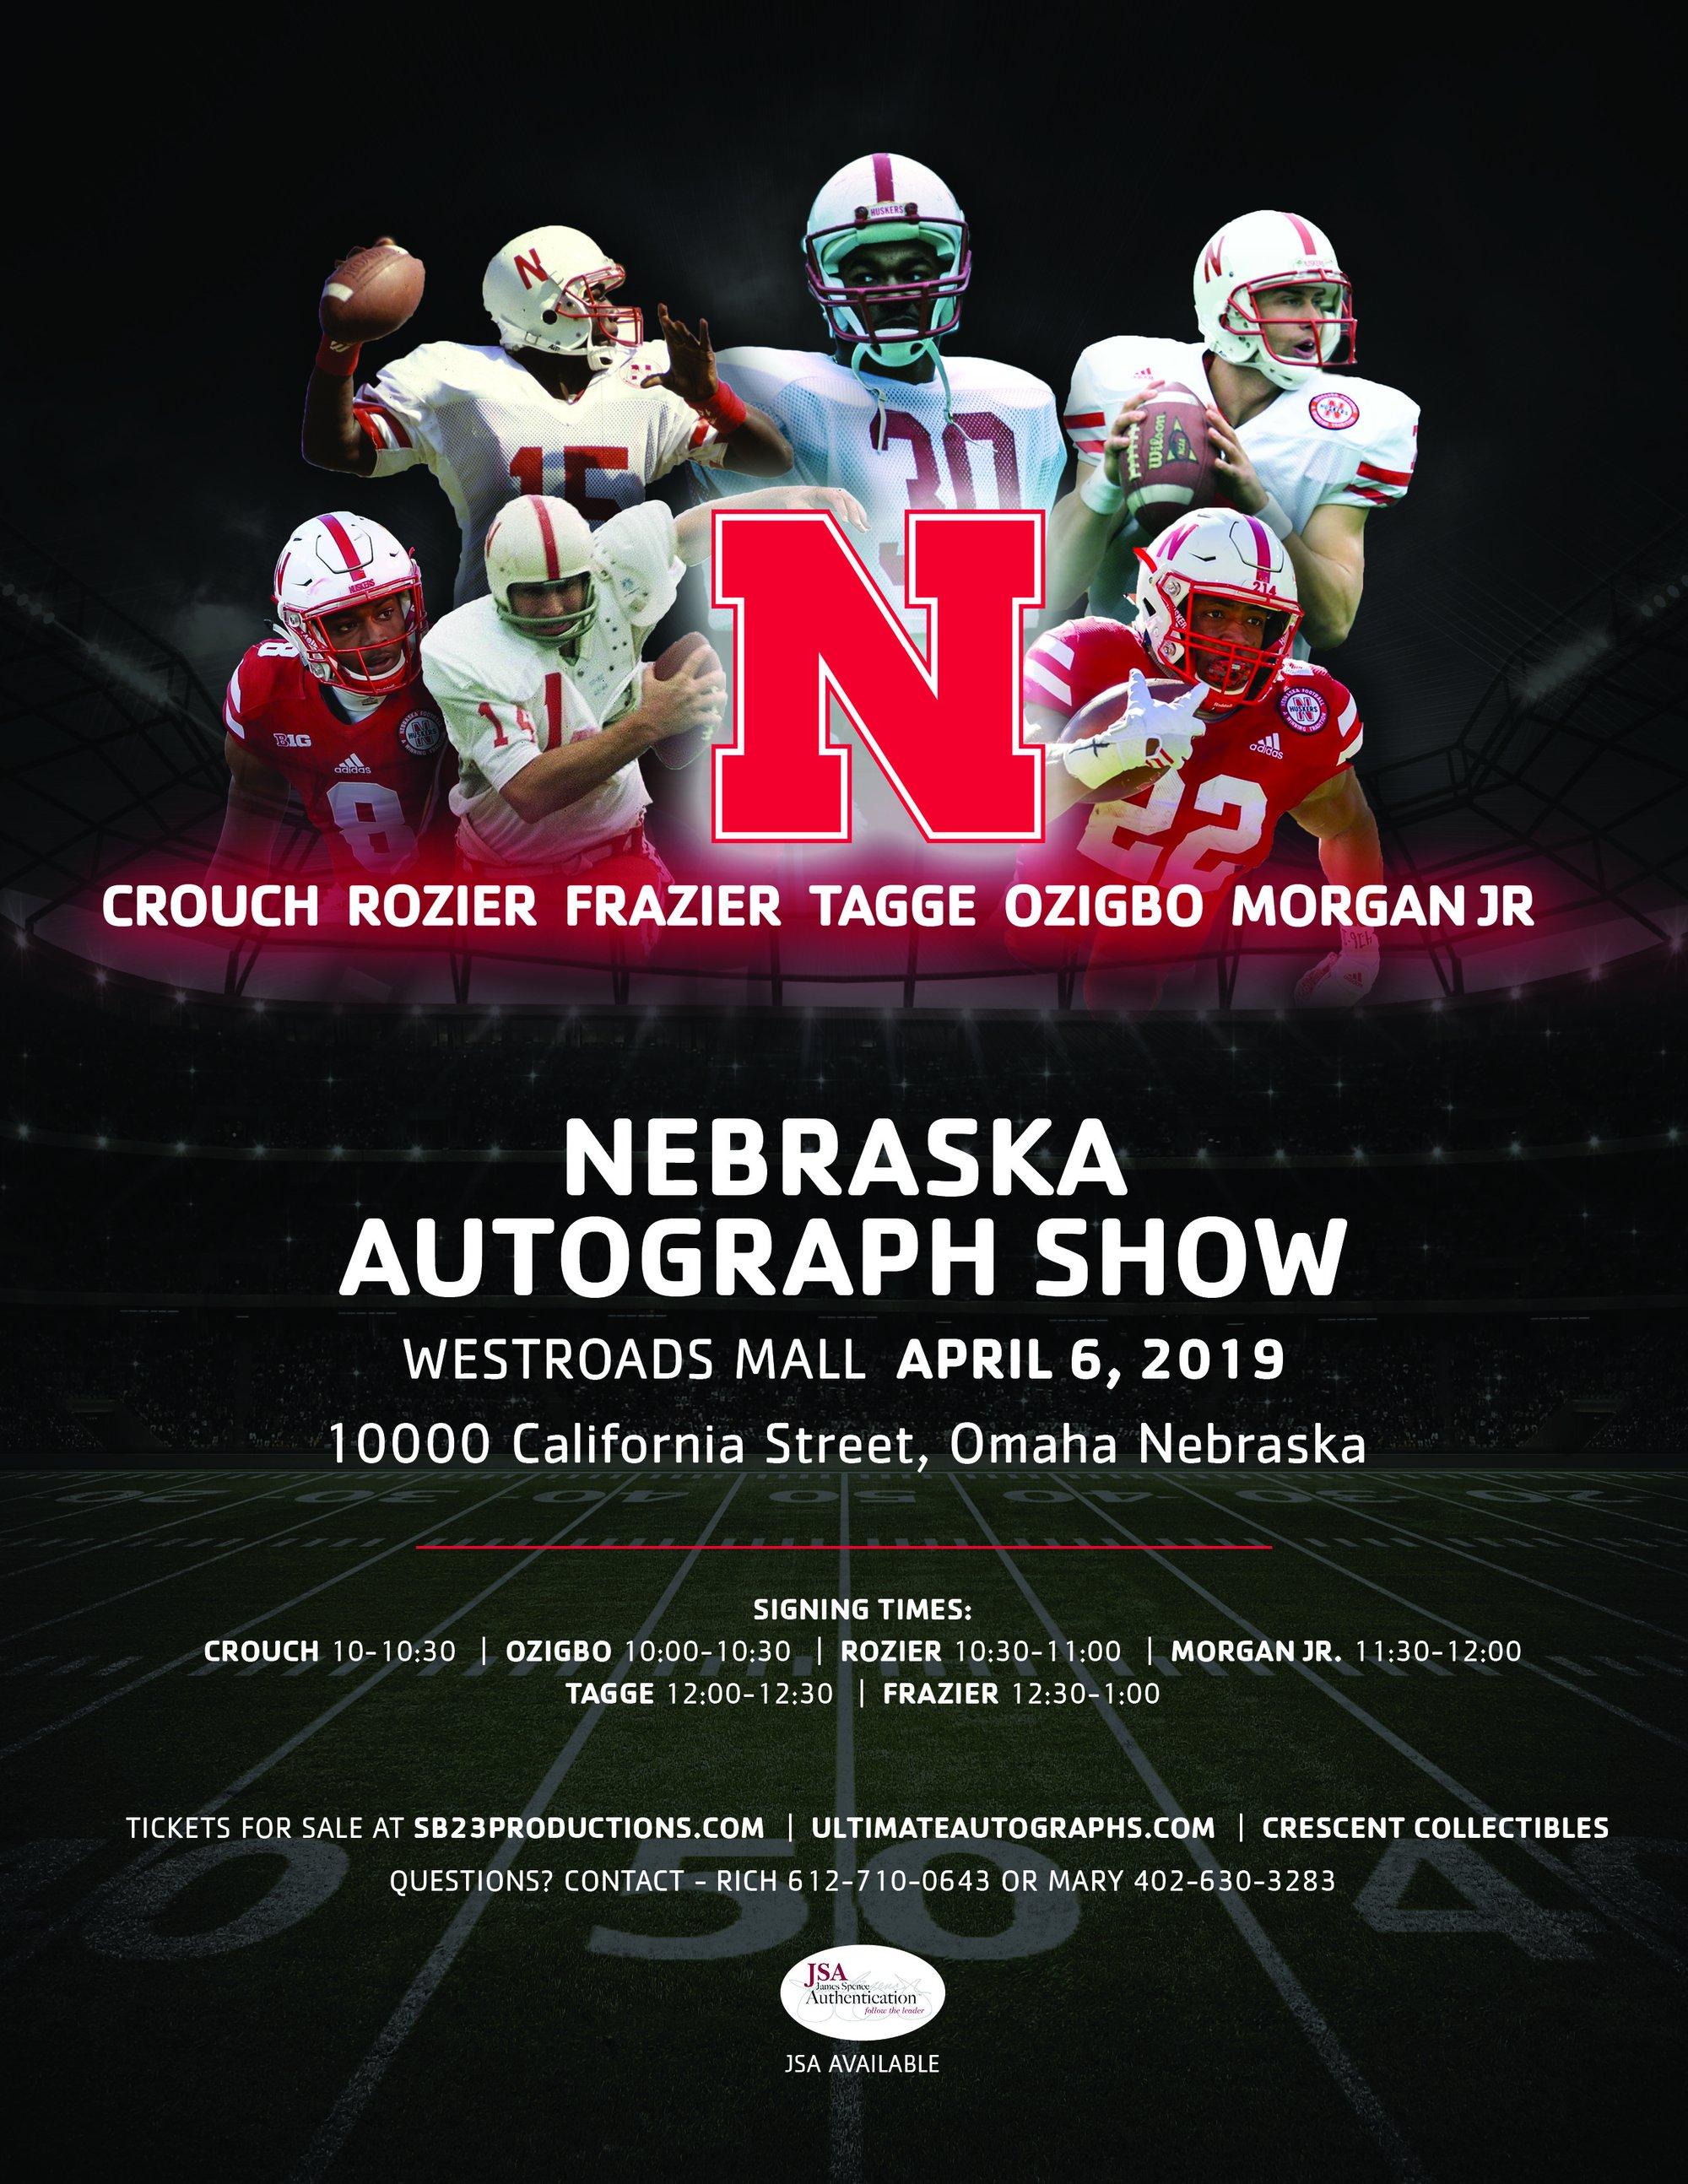 Nebraska_Flyer_v7_Mall_6a60c9af-cff0-4656-9427-16e3033ddea5_2000x.jpg